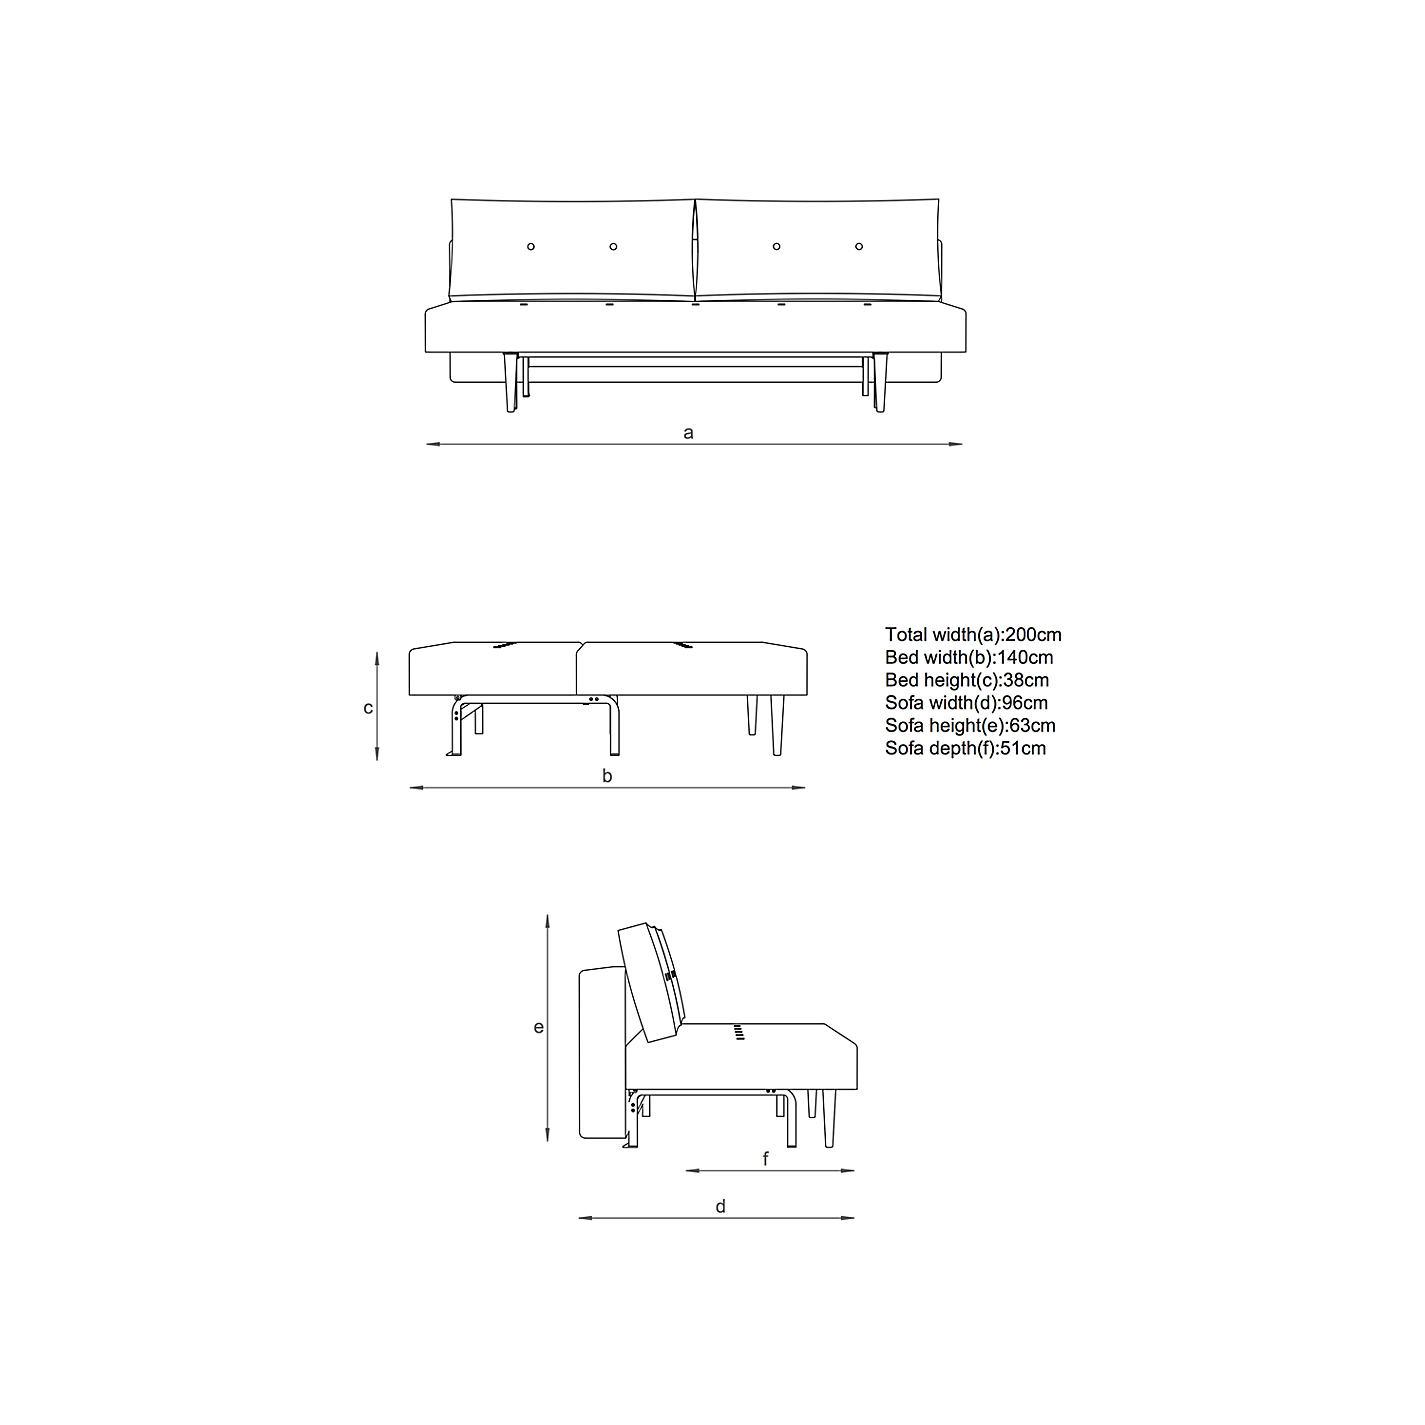 Sofa Height buy innovation recast sofa bed with pocket sprung mattress, dark